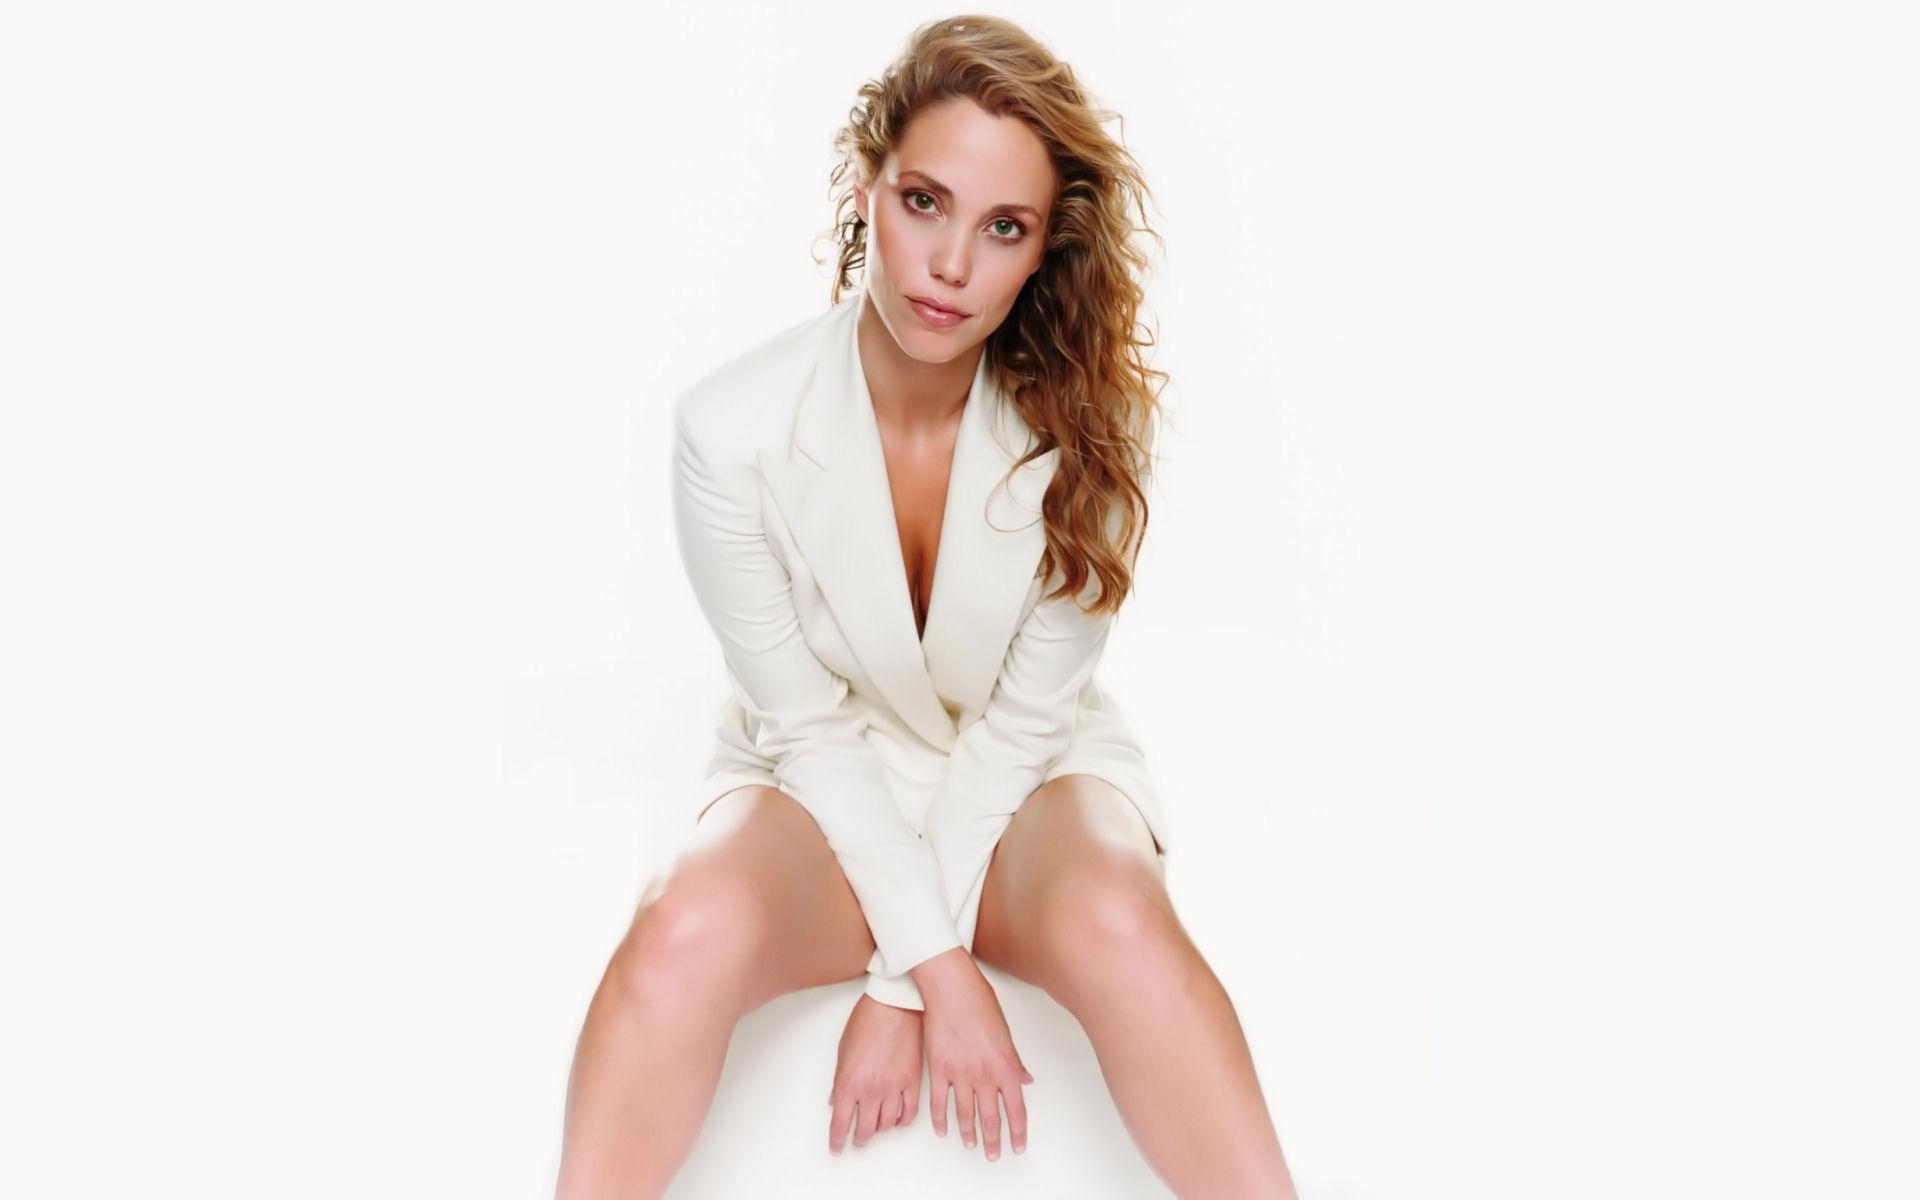 Download High quality only white jacket Elizabeth Berkley wallpaper / 1920x1200